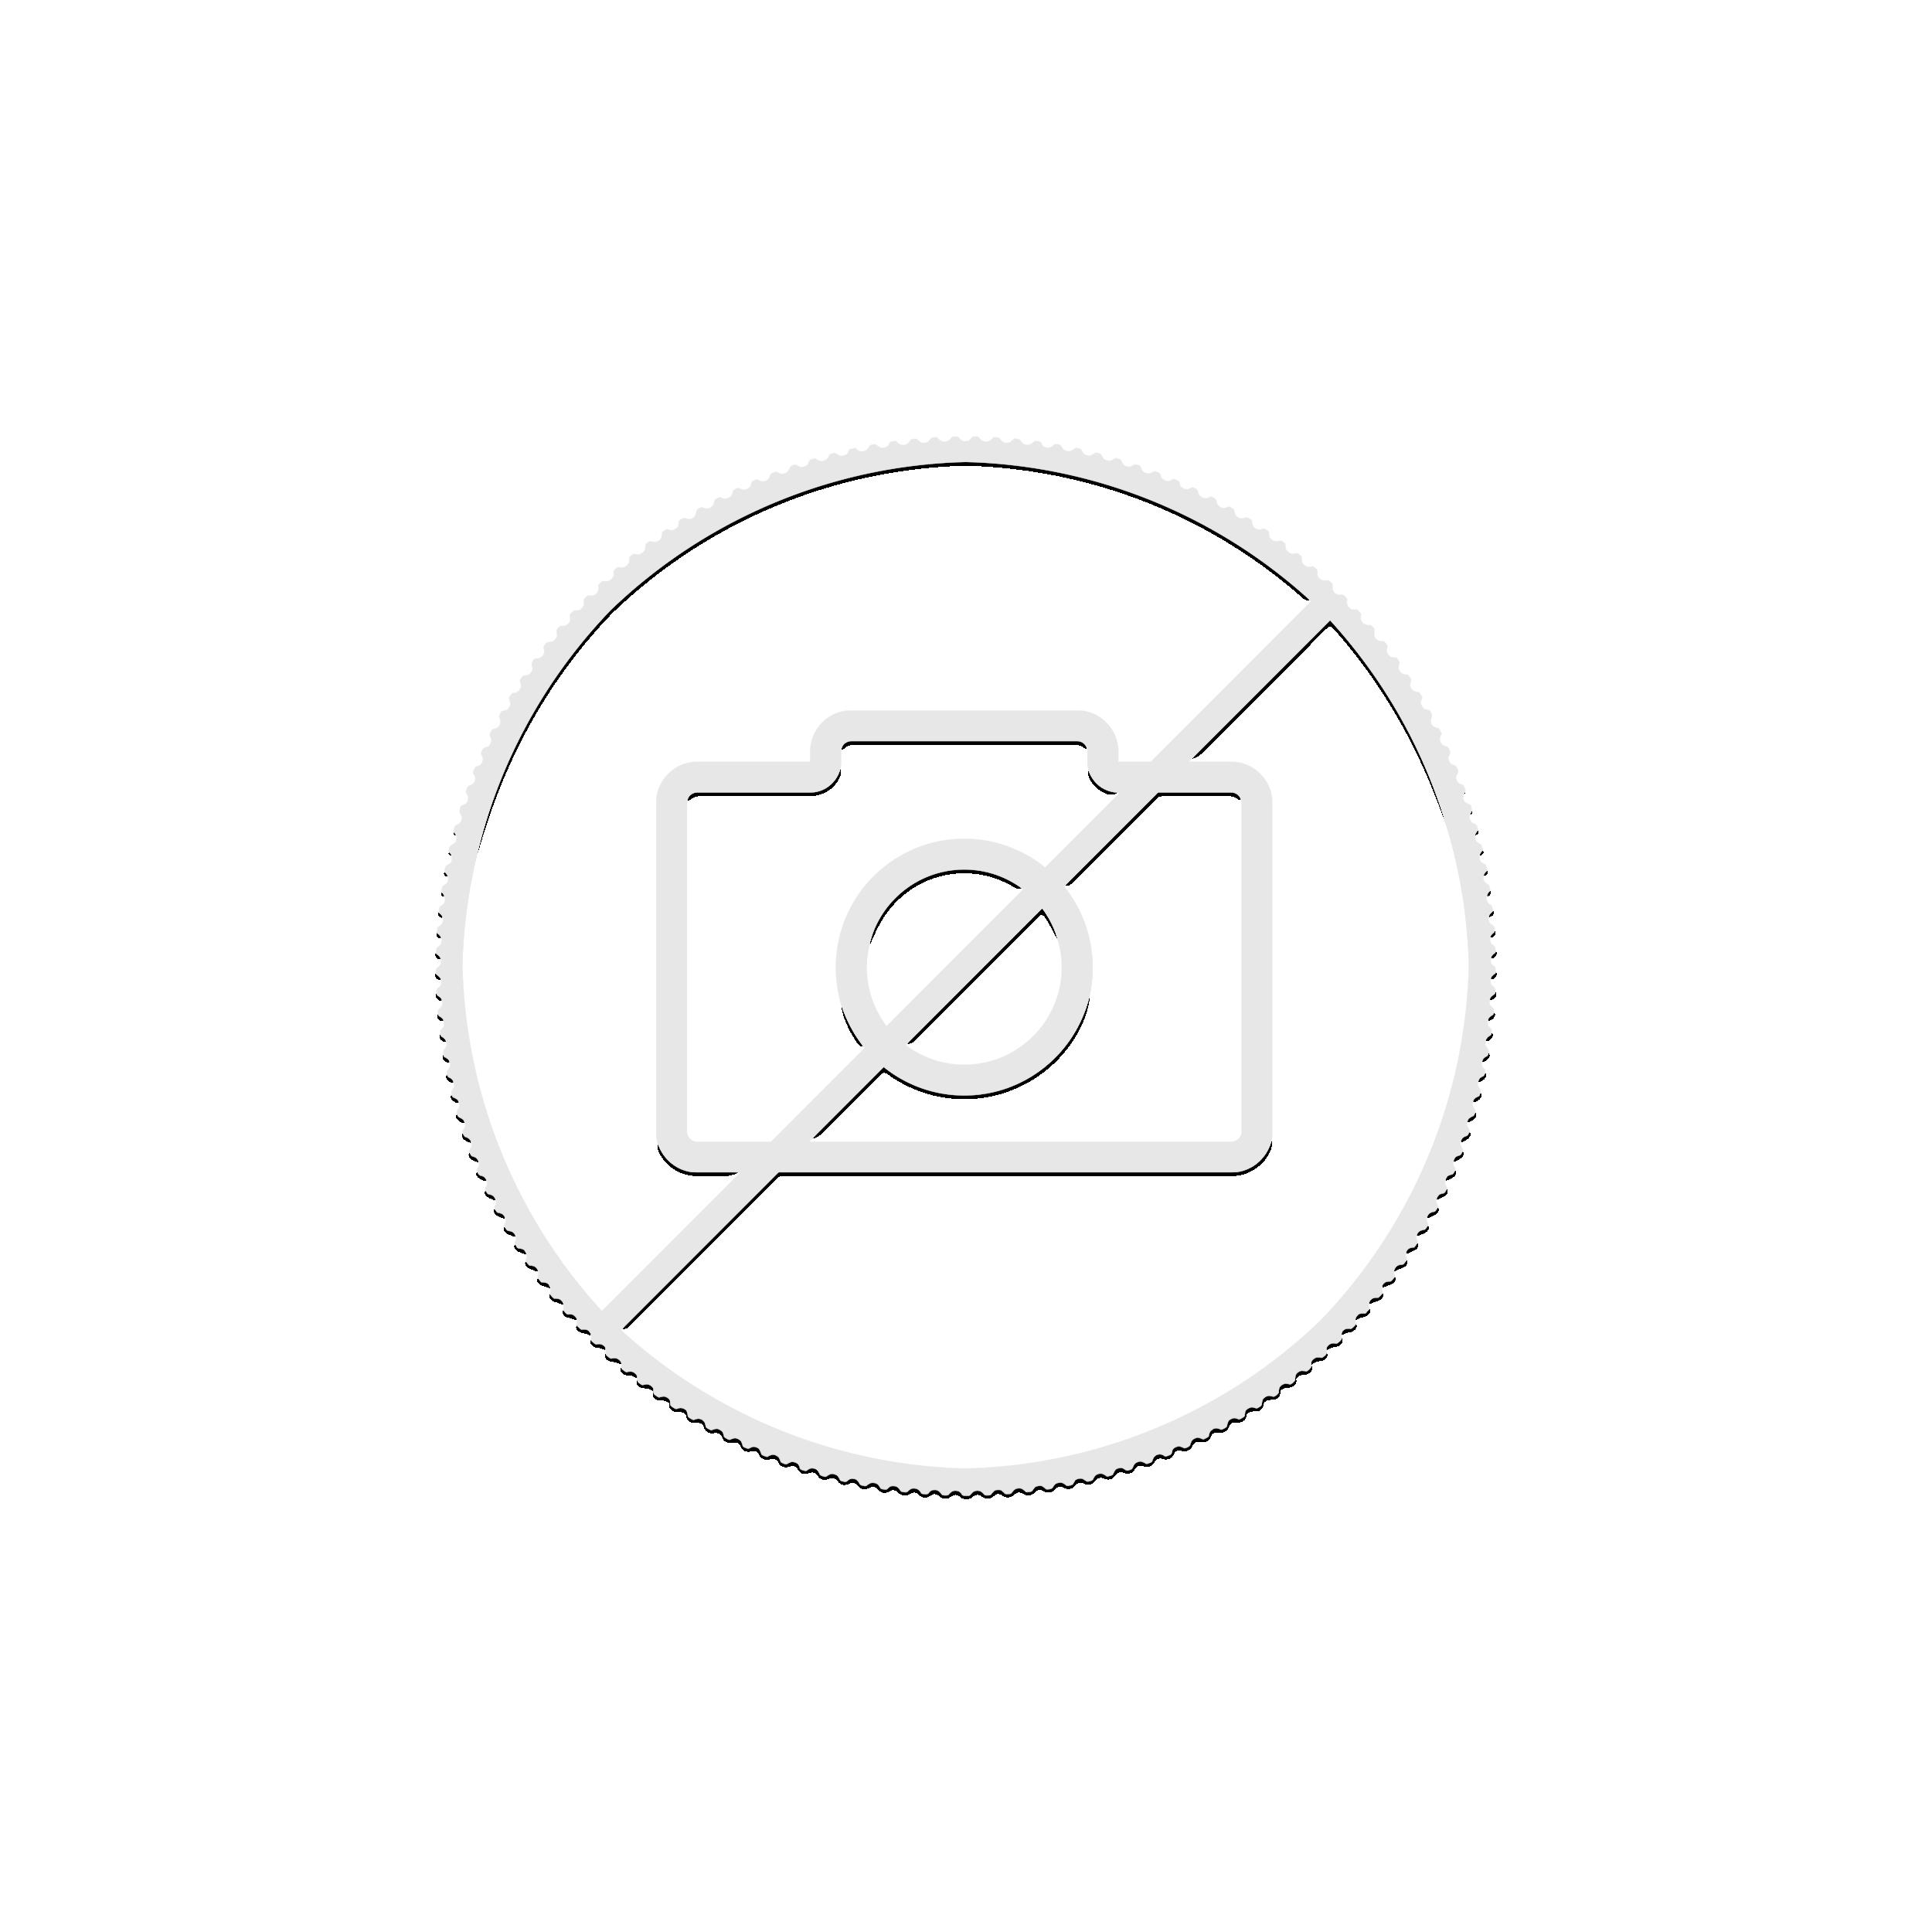 30 Gram gouden munt Panda 2018